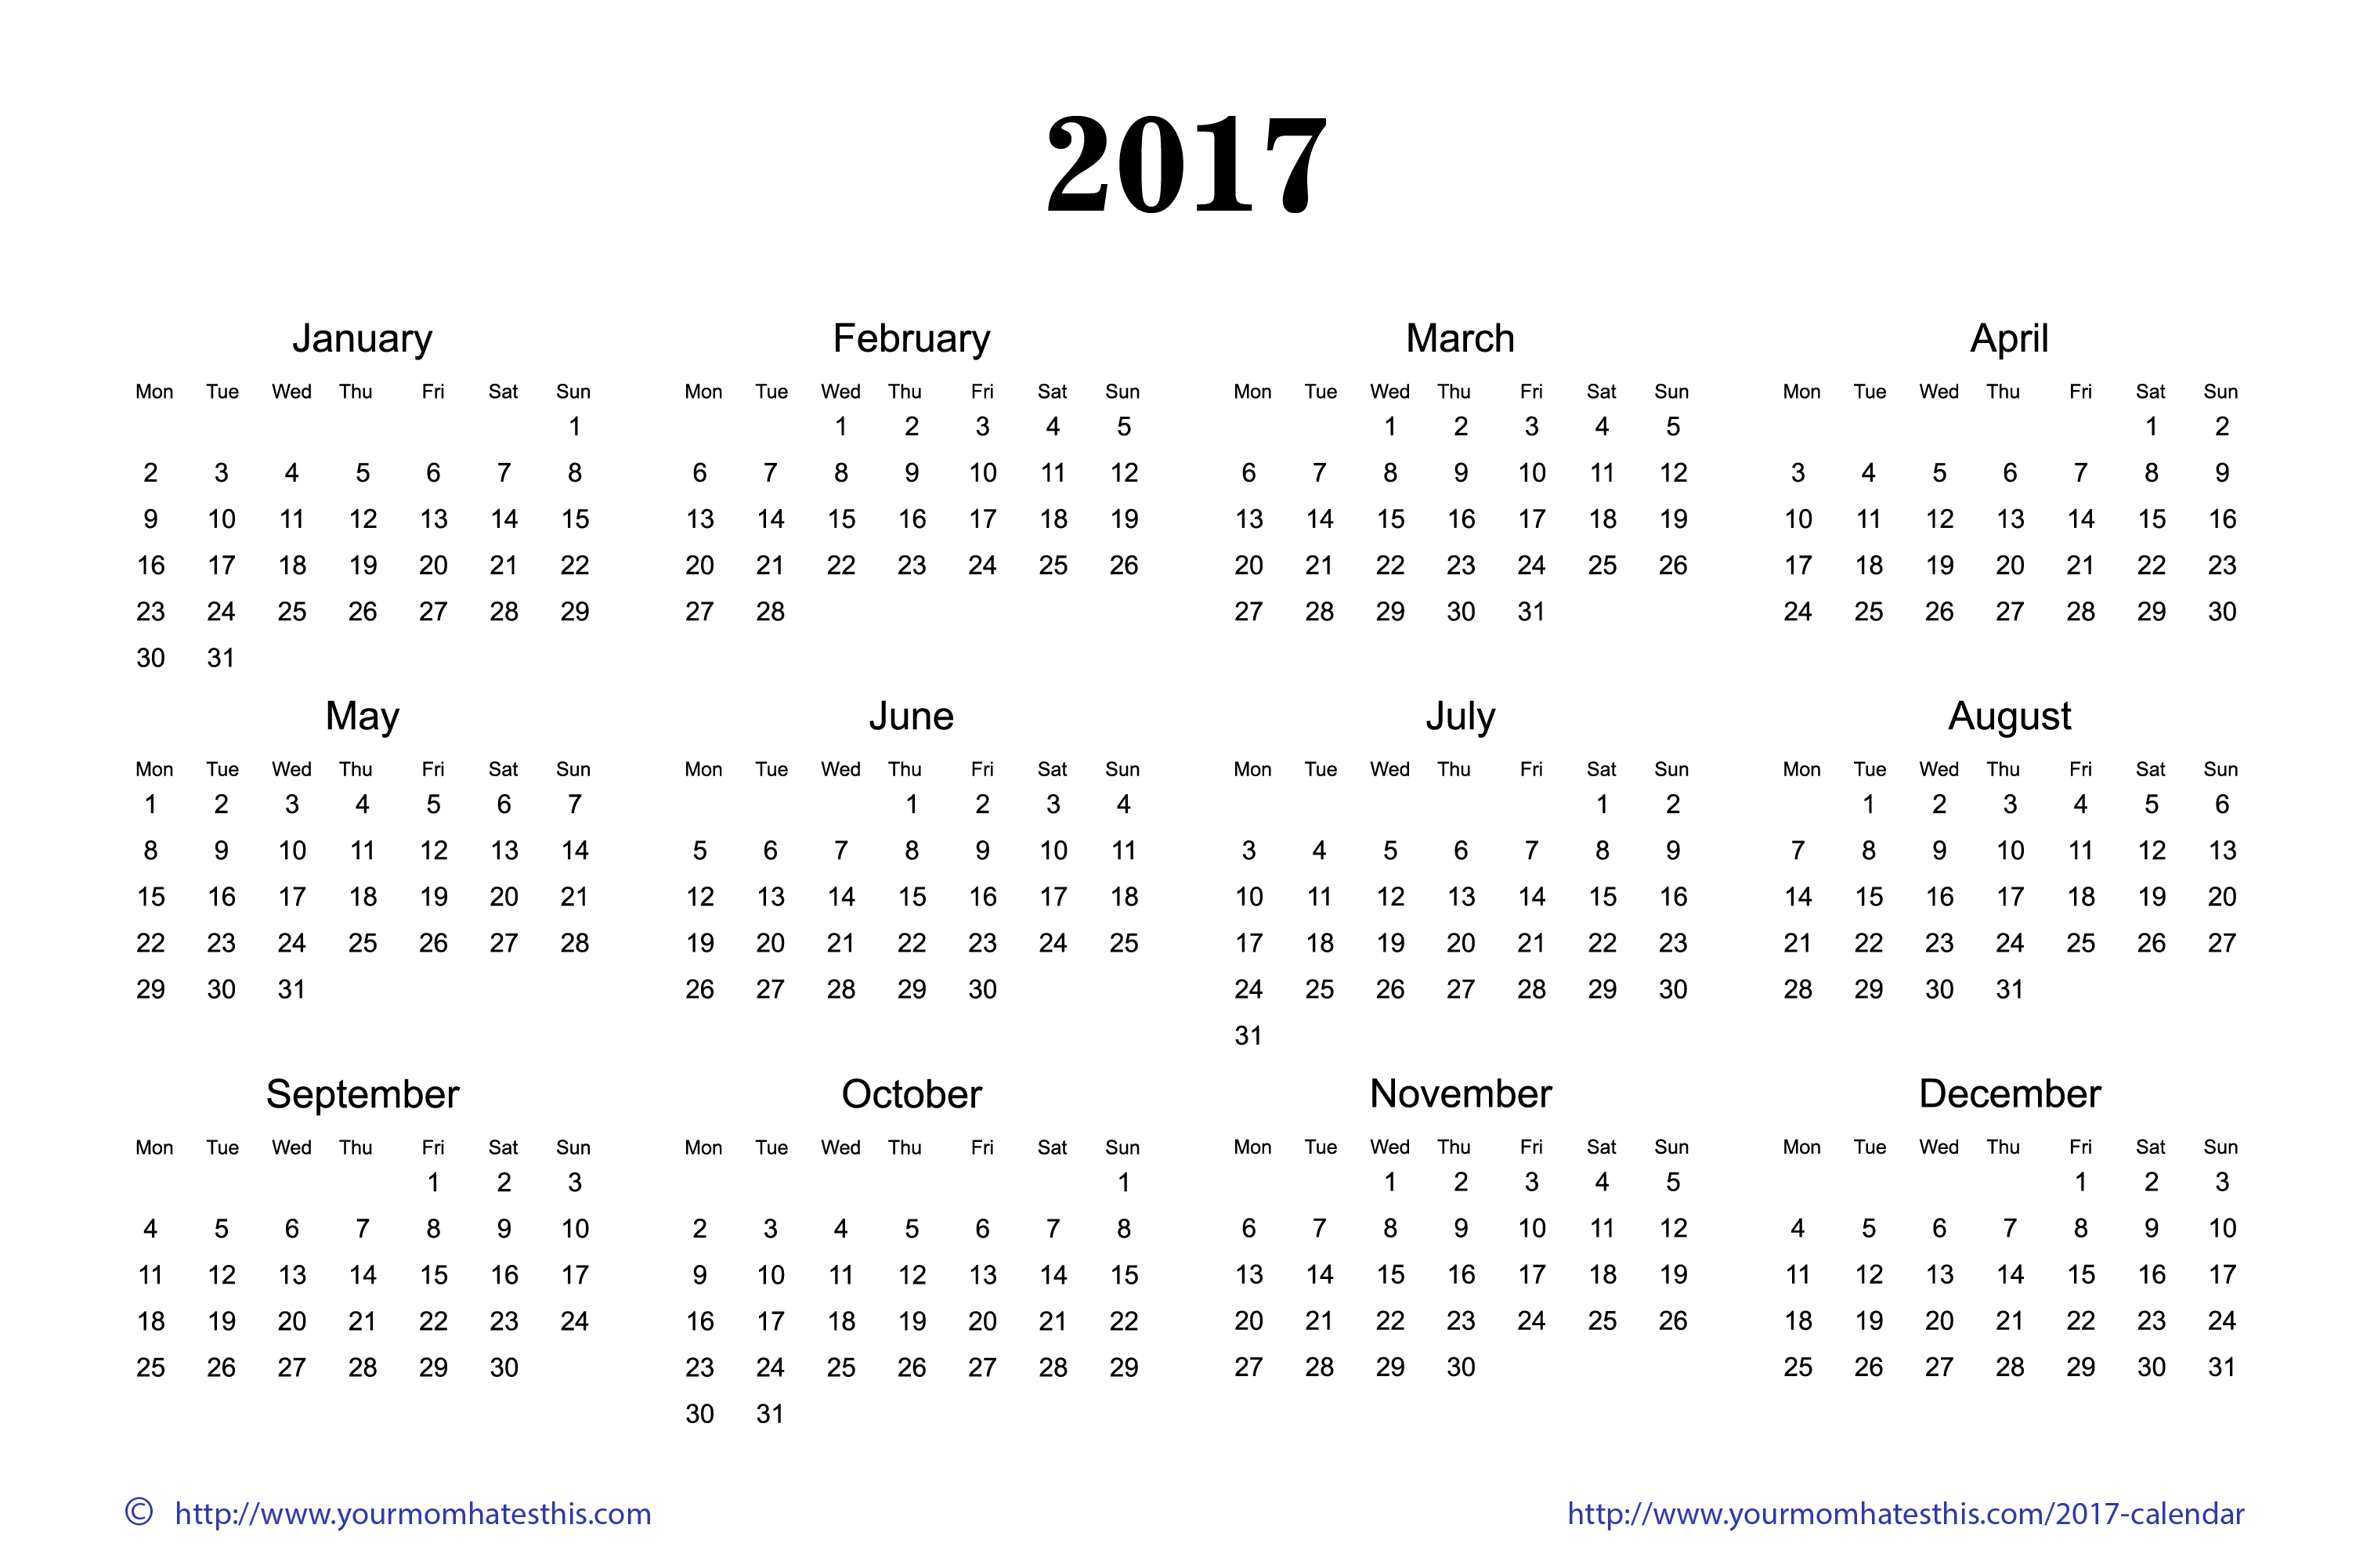 2017 Calendar Printable Images